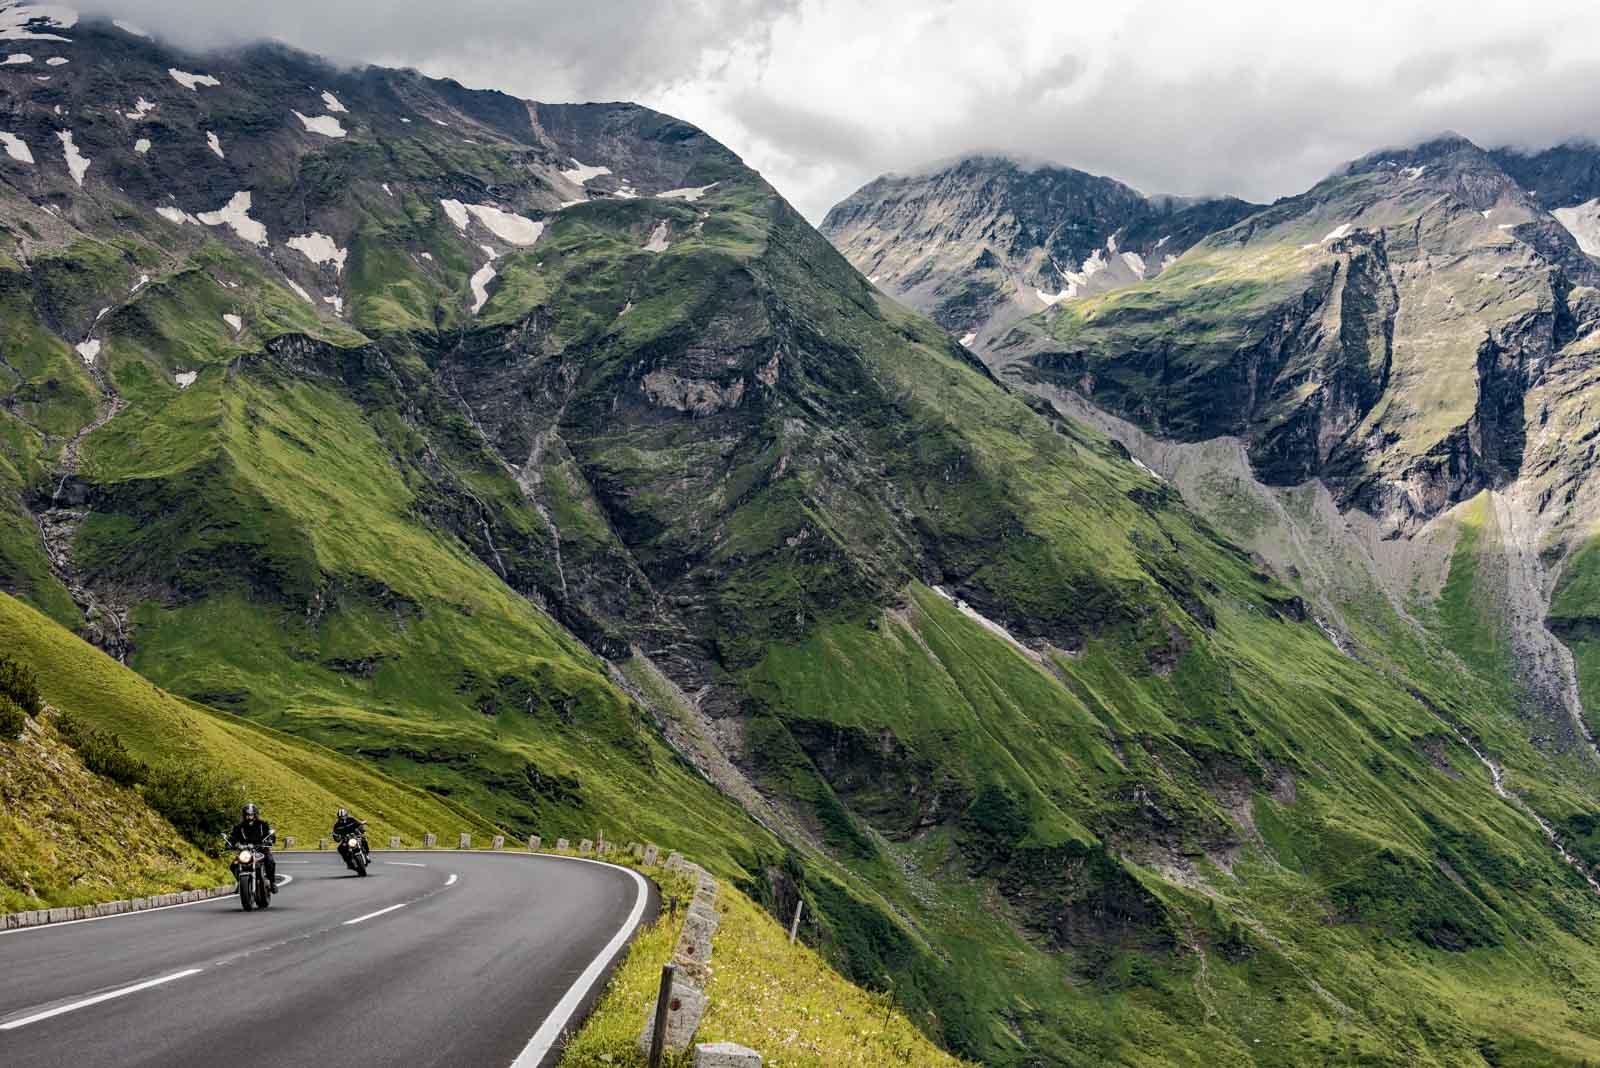 Grossglockner High Alpine Road, Austria צילום: ניר רויטמן